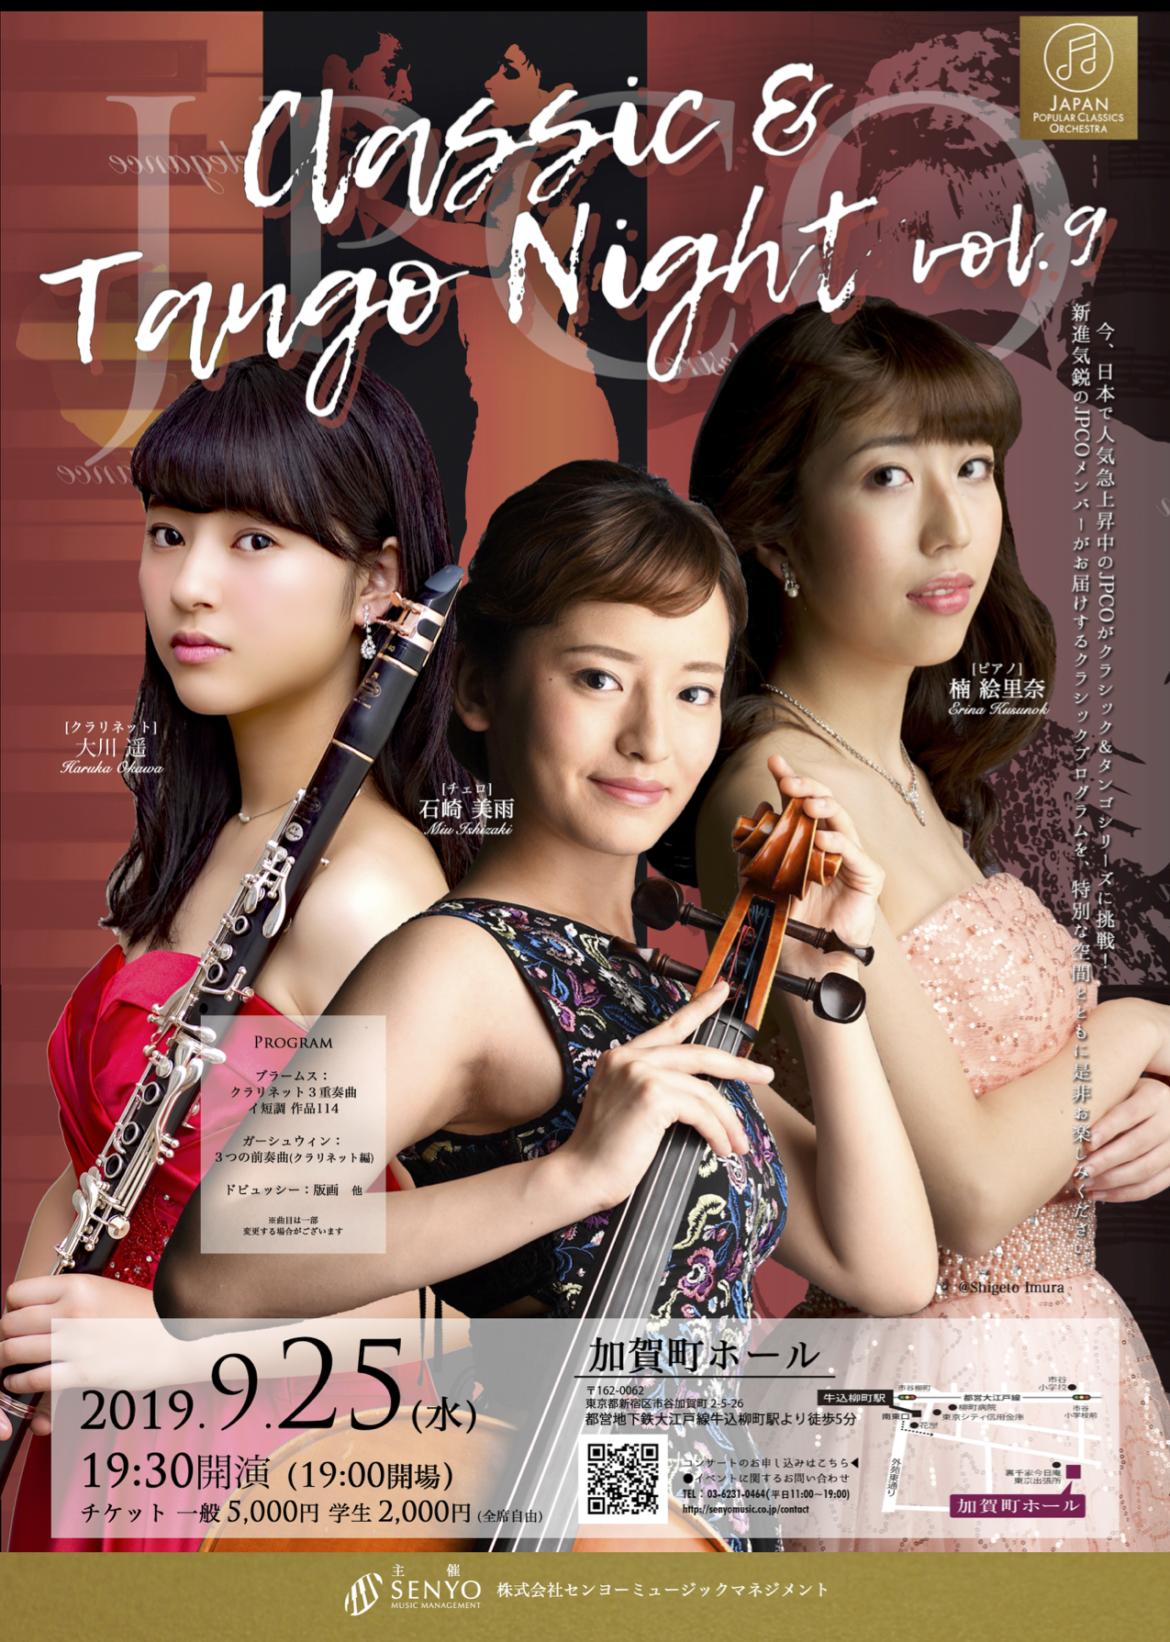 2019.9.25  JPCO CLASSIC & TANGO NIGHT  vol.9